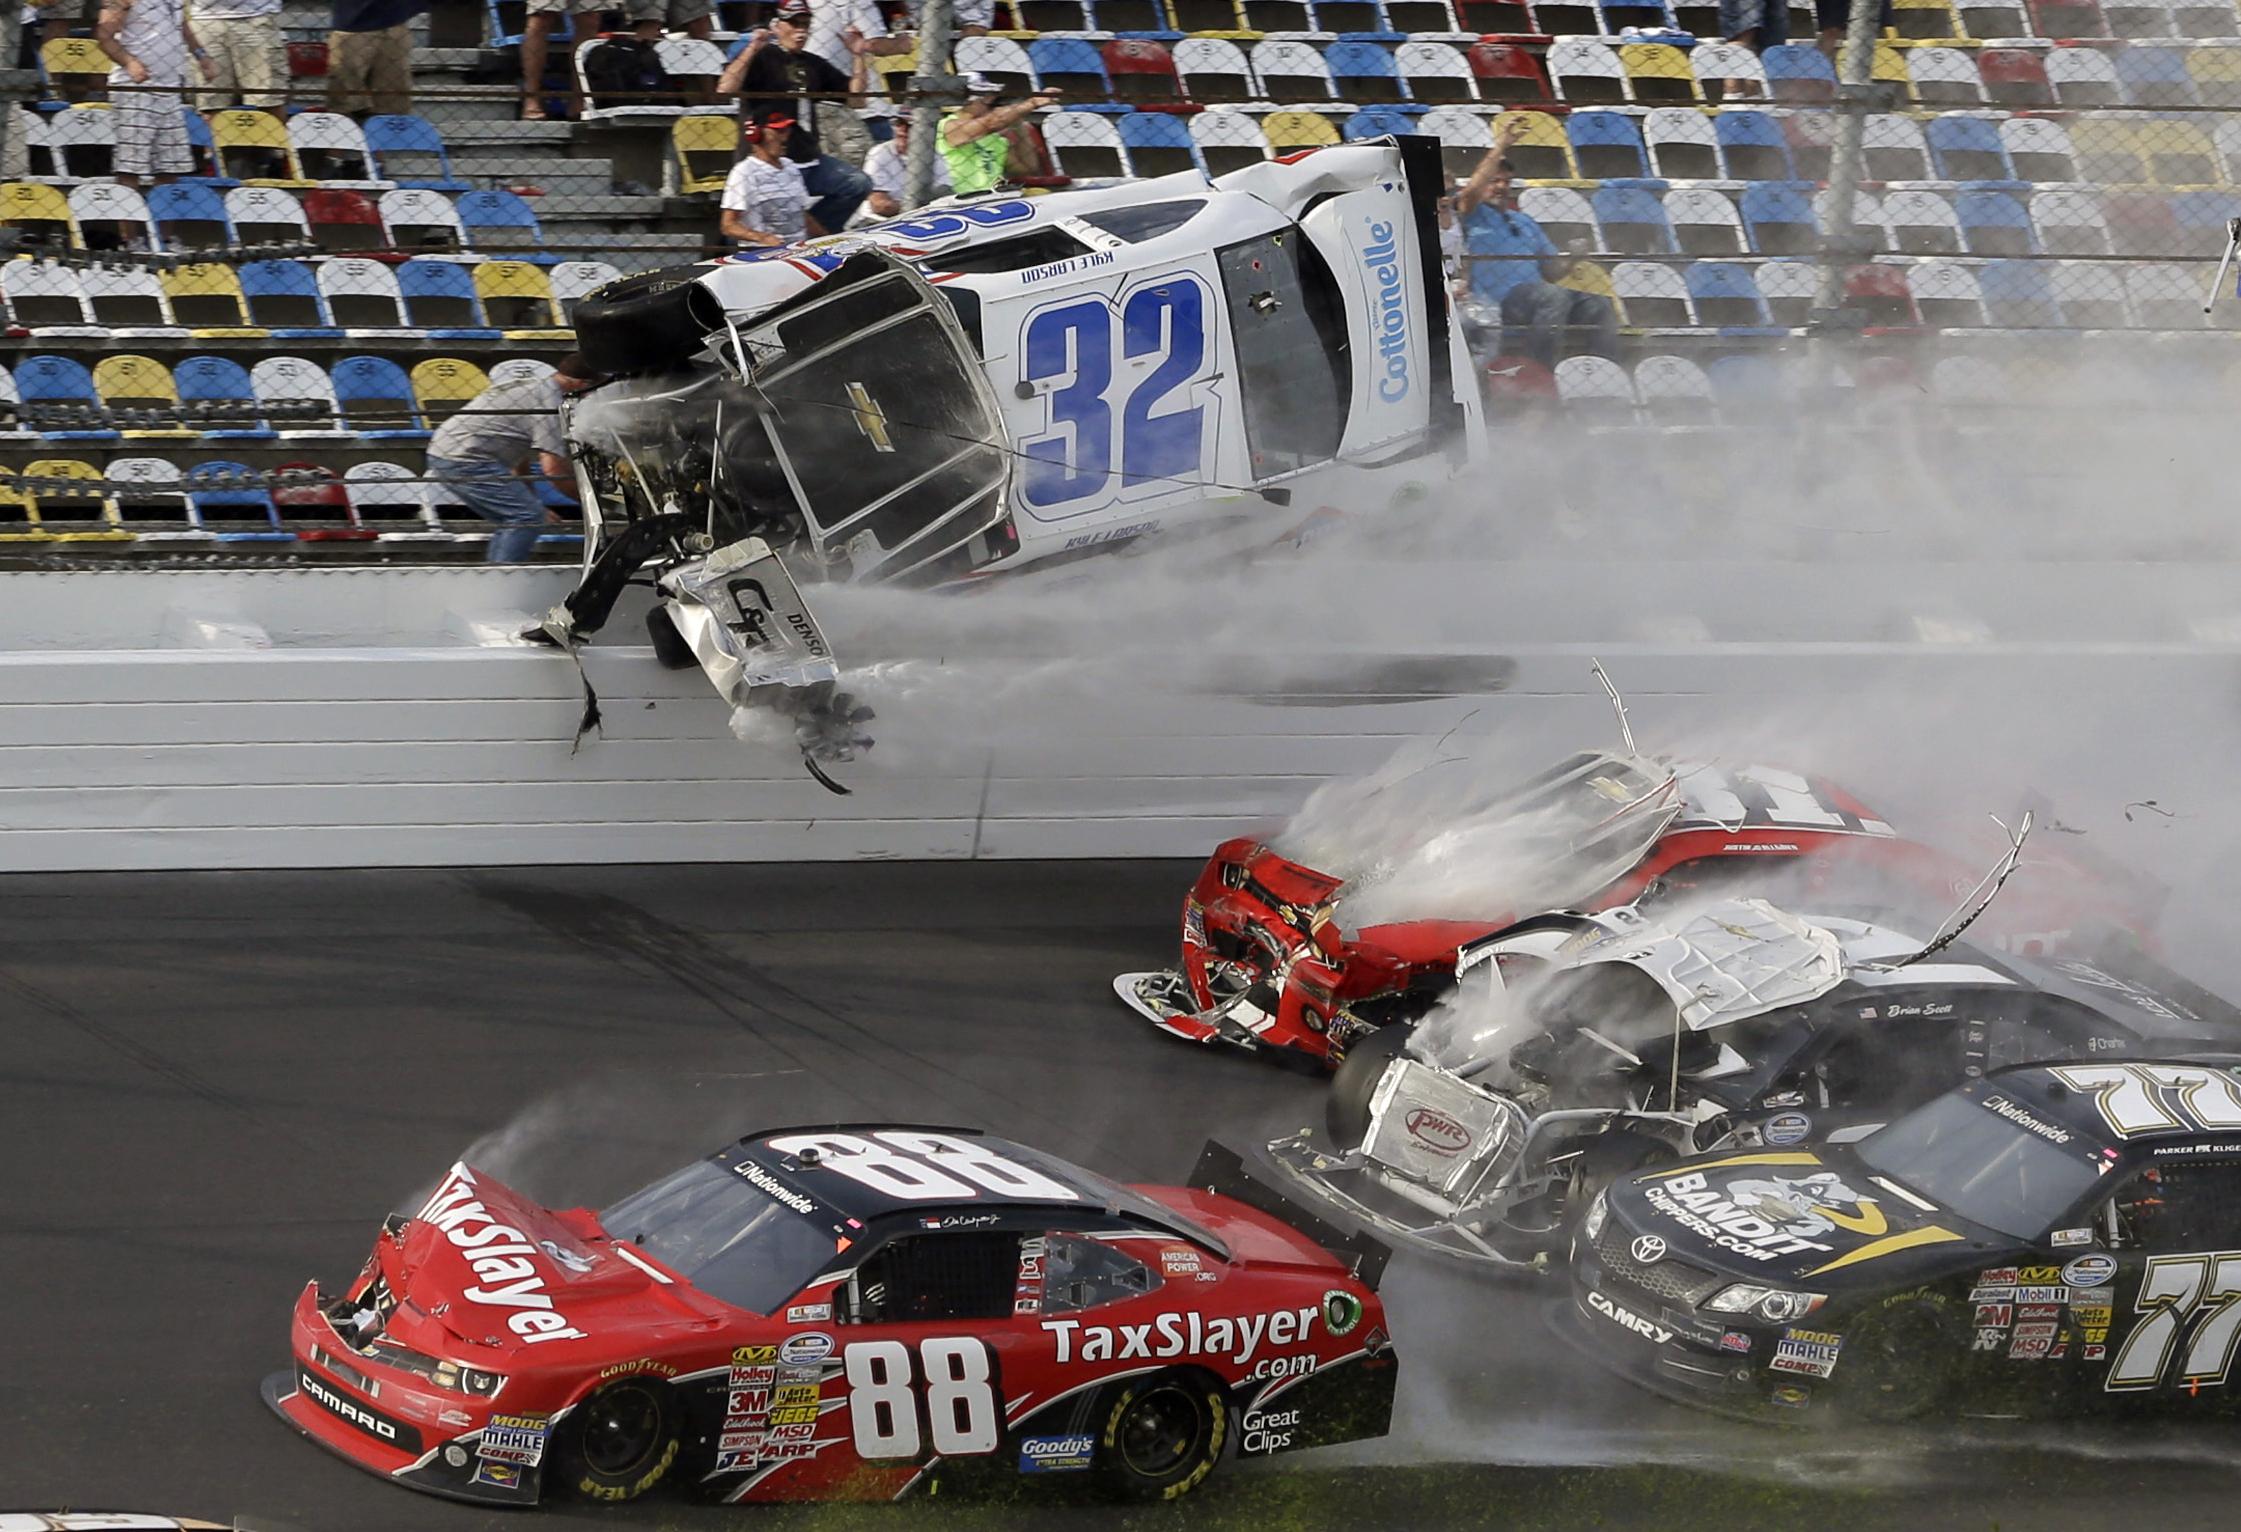 Fans Hurt As Daytona Crash Sends Debris Into Stands The Daily Gazette